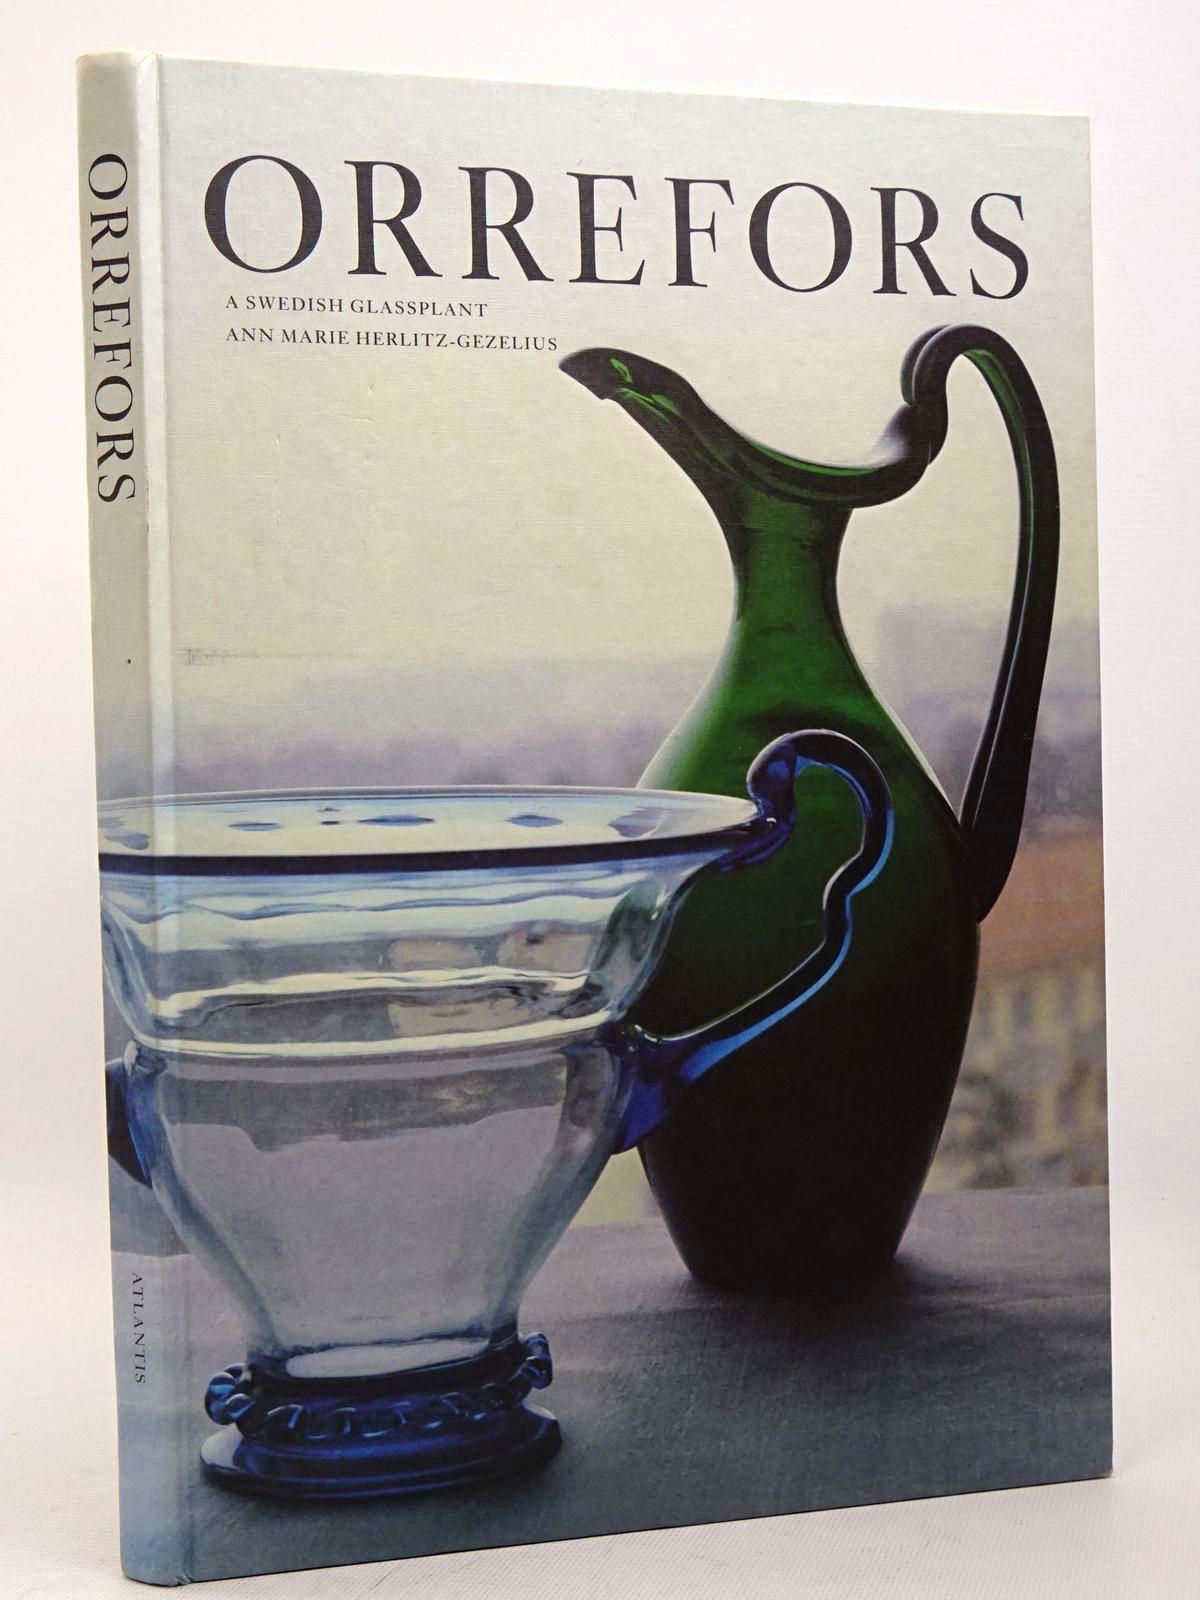 Photo of ORREFORS: A SWEDISH GLASSPLANT